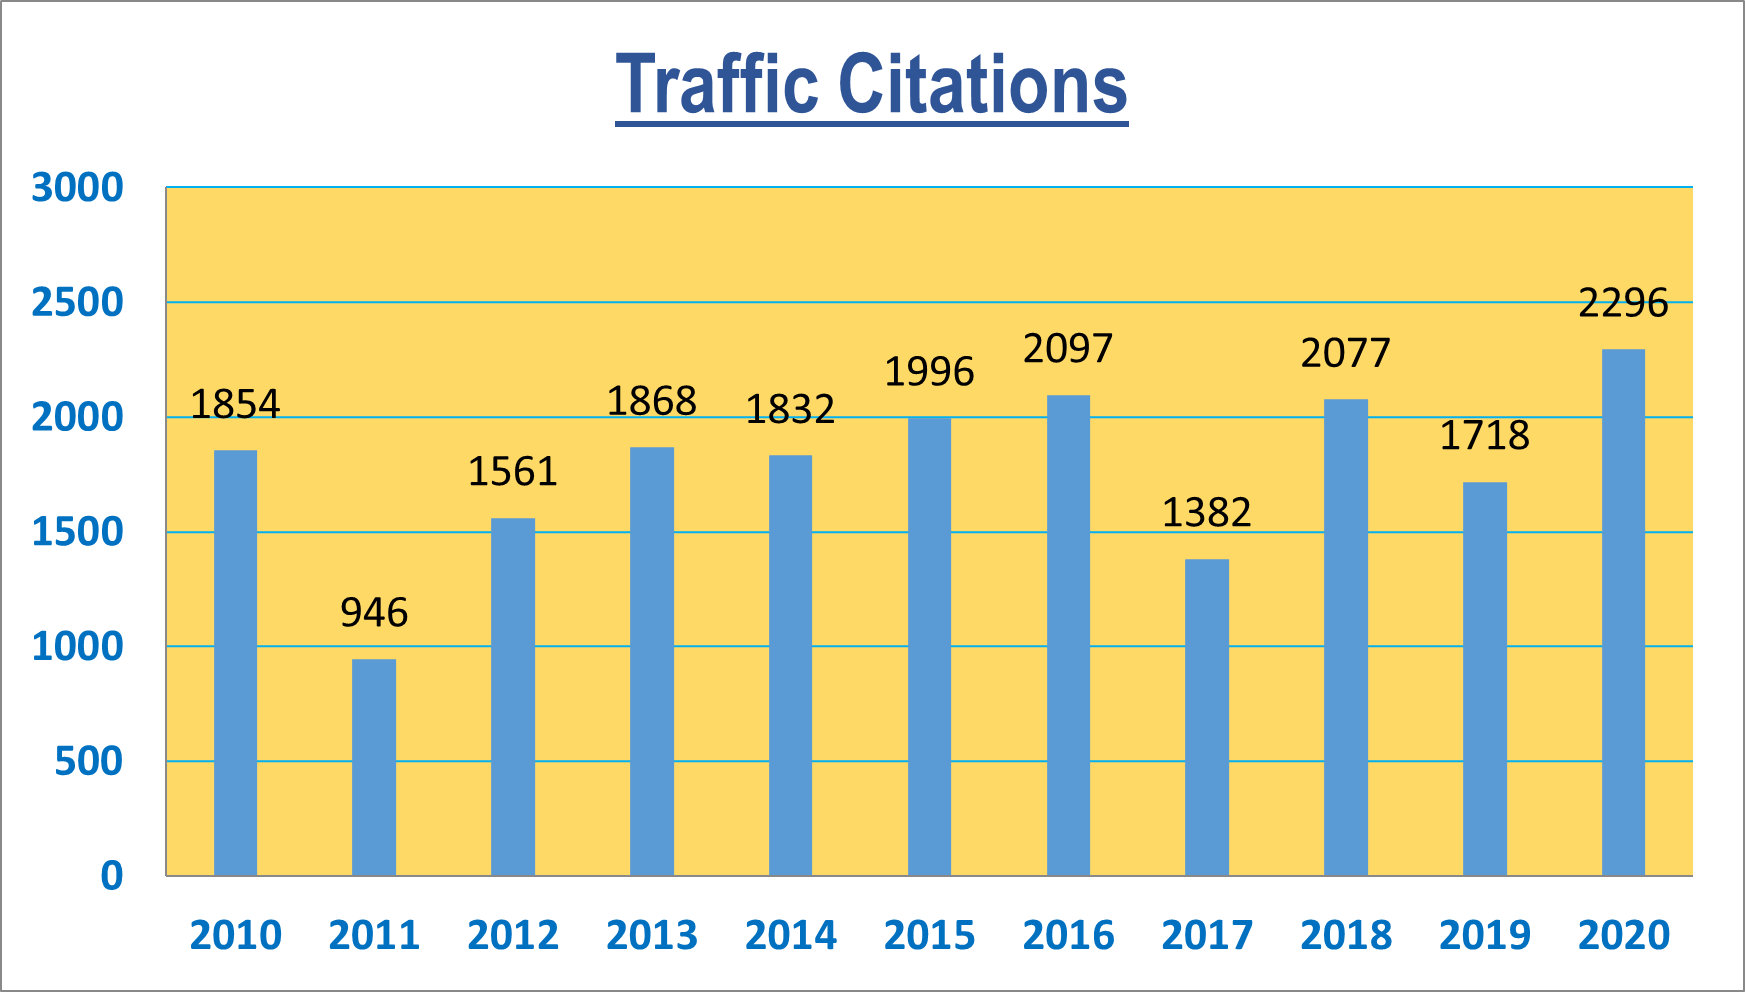 2020 traffic arrests